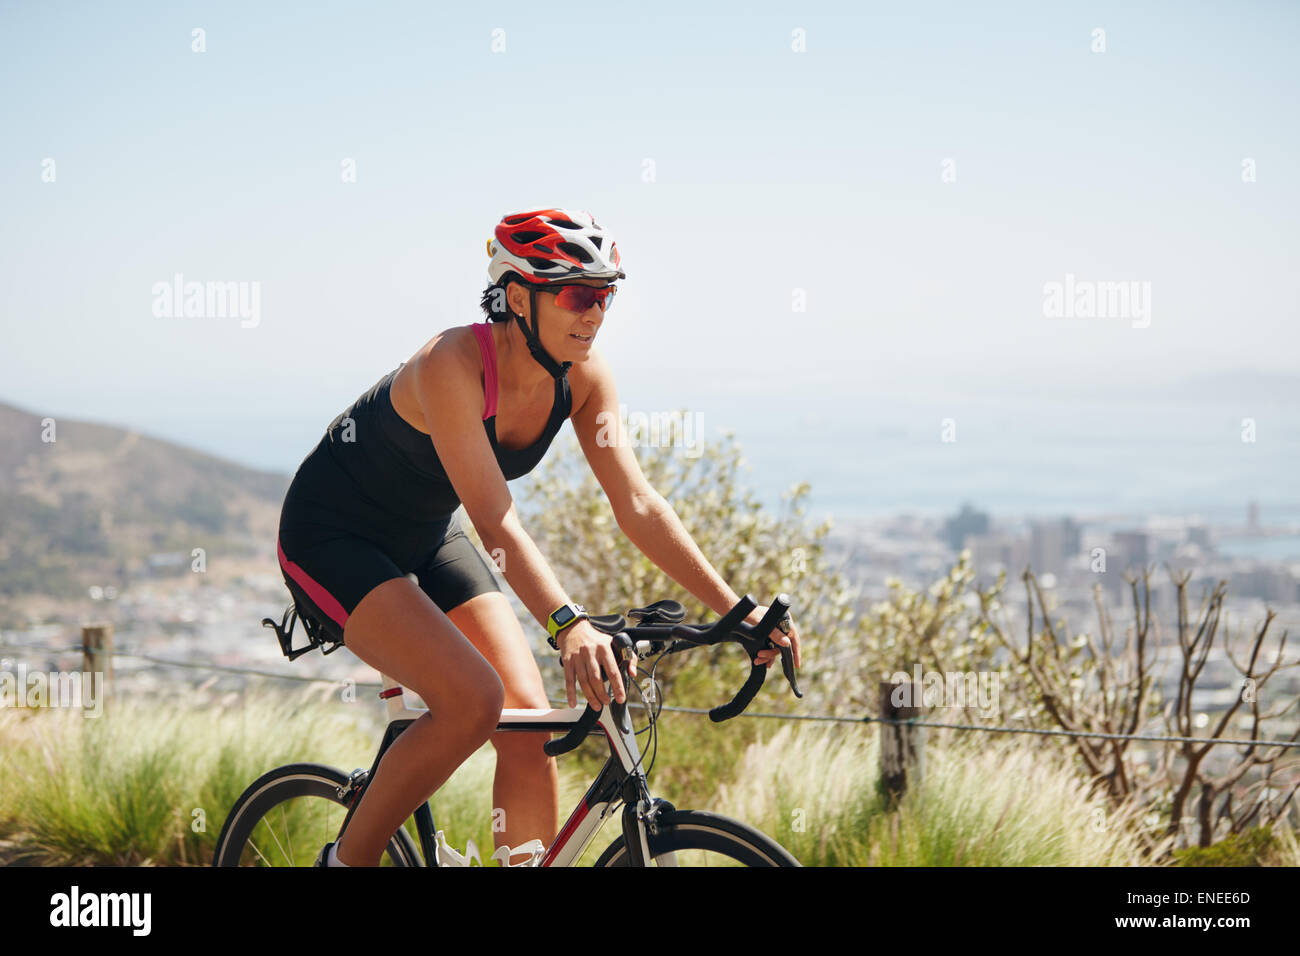 Disparó al aire libre de un ciclista femenino caballo bicicleta de carreras. Mujer en bicicleta por carretera Imagen De Stock